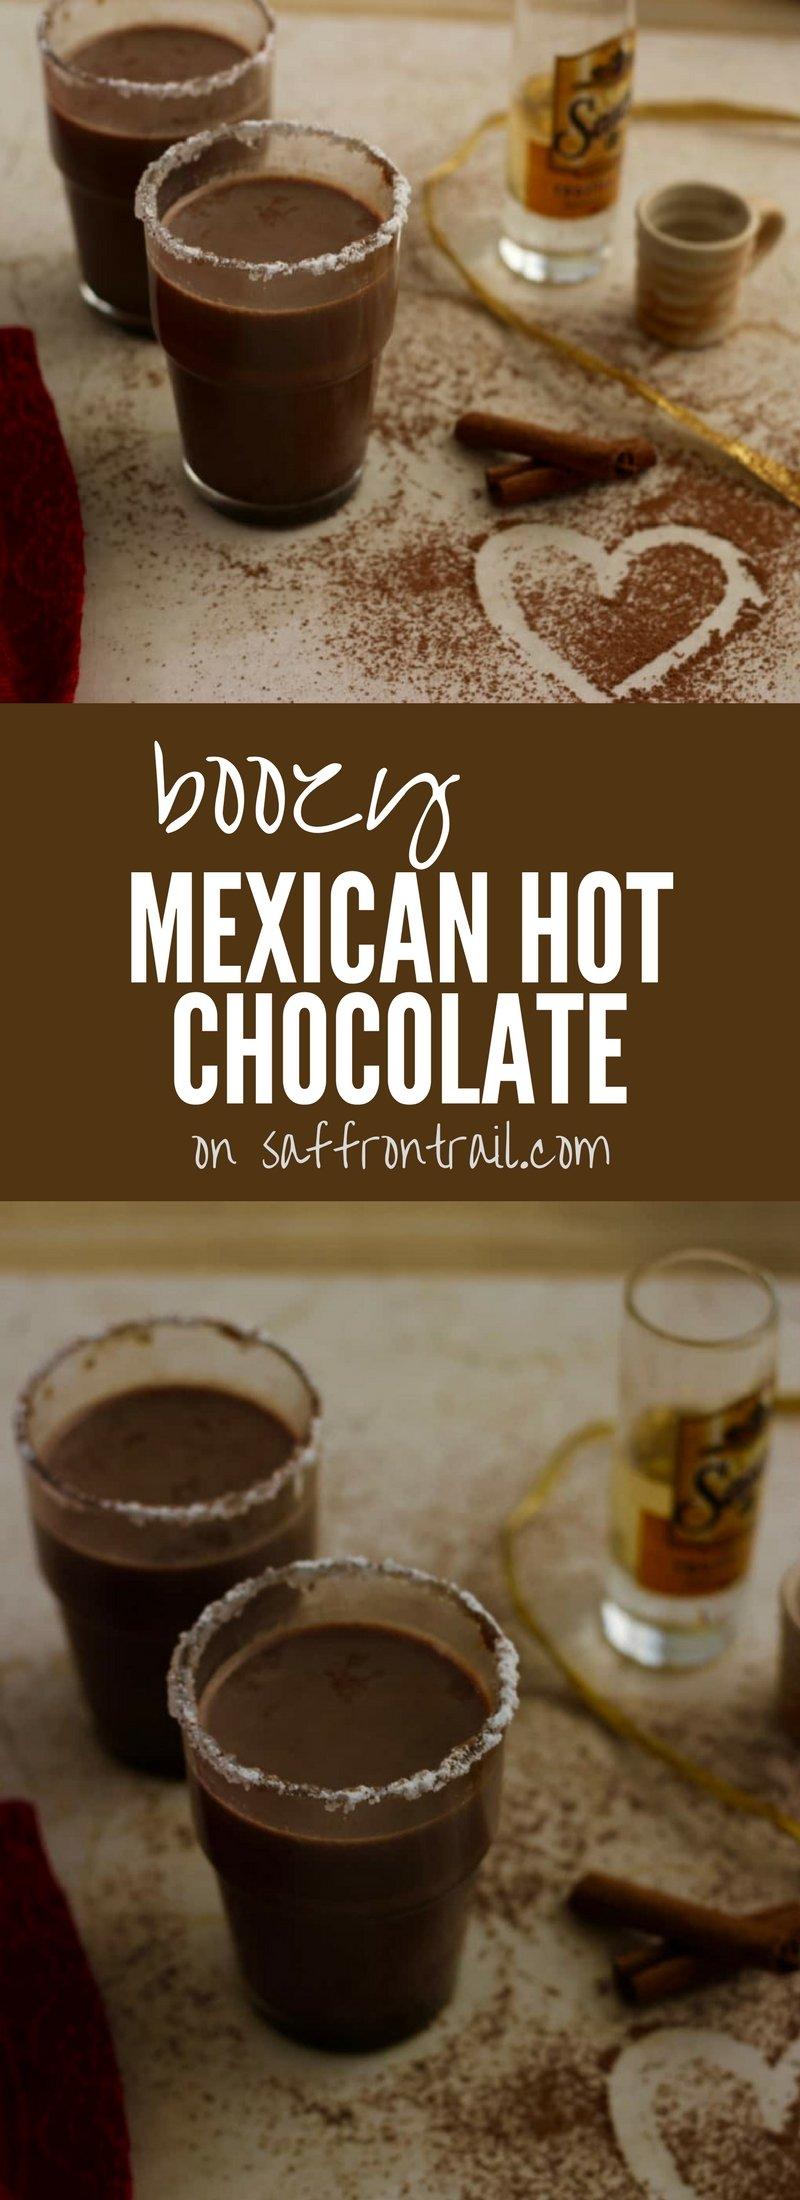 Mexican Boozy Hot Chocolate for Two Recipe | Saffron Trail